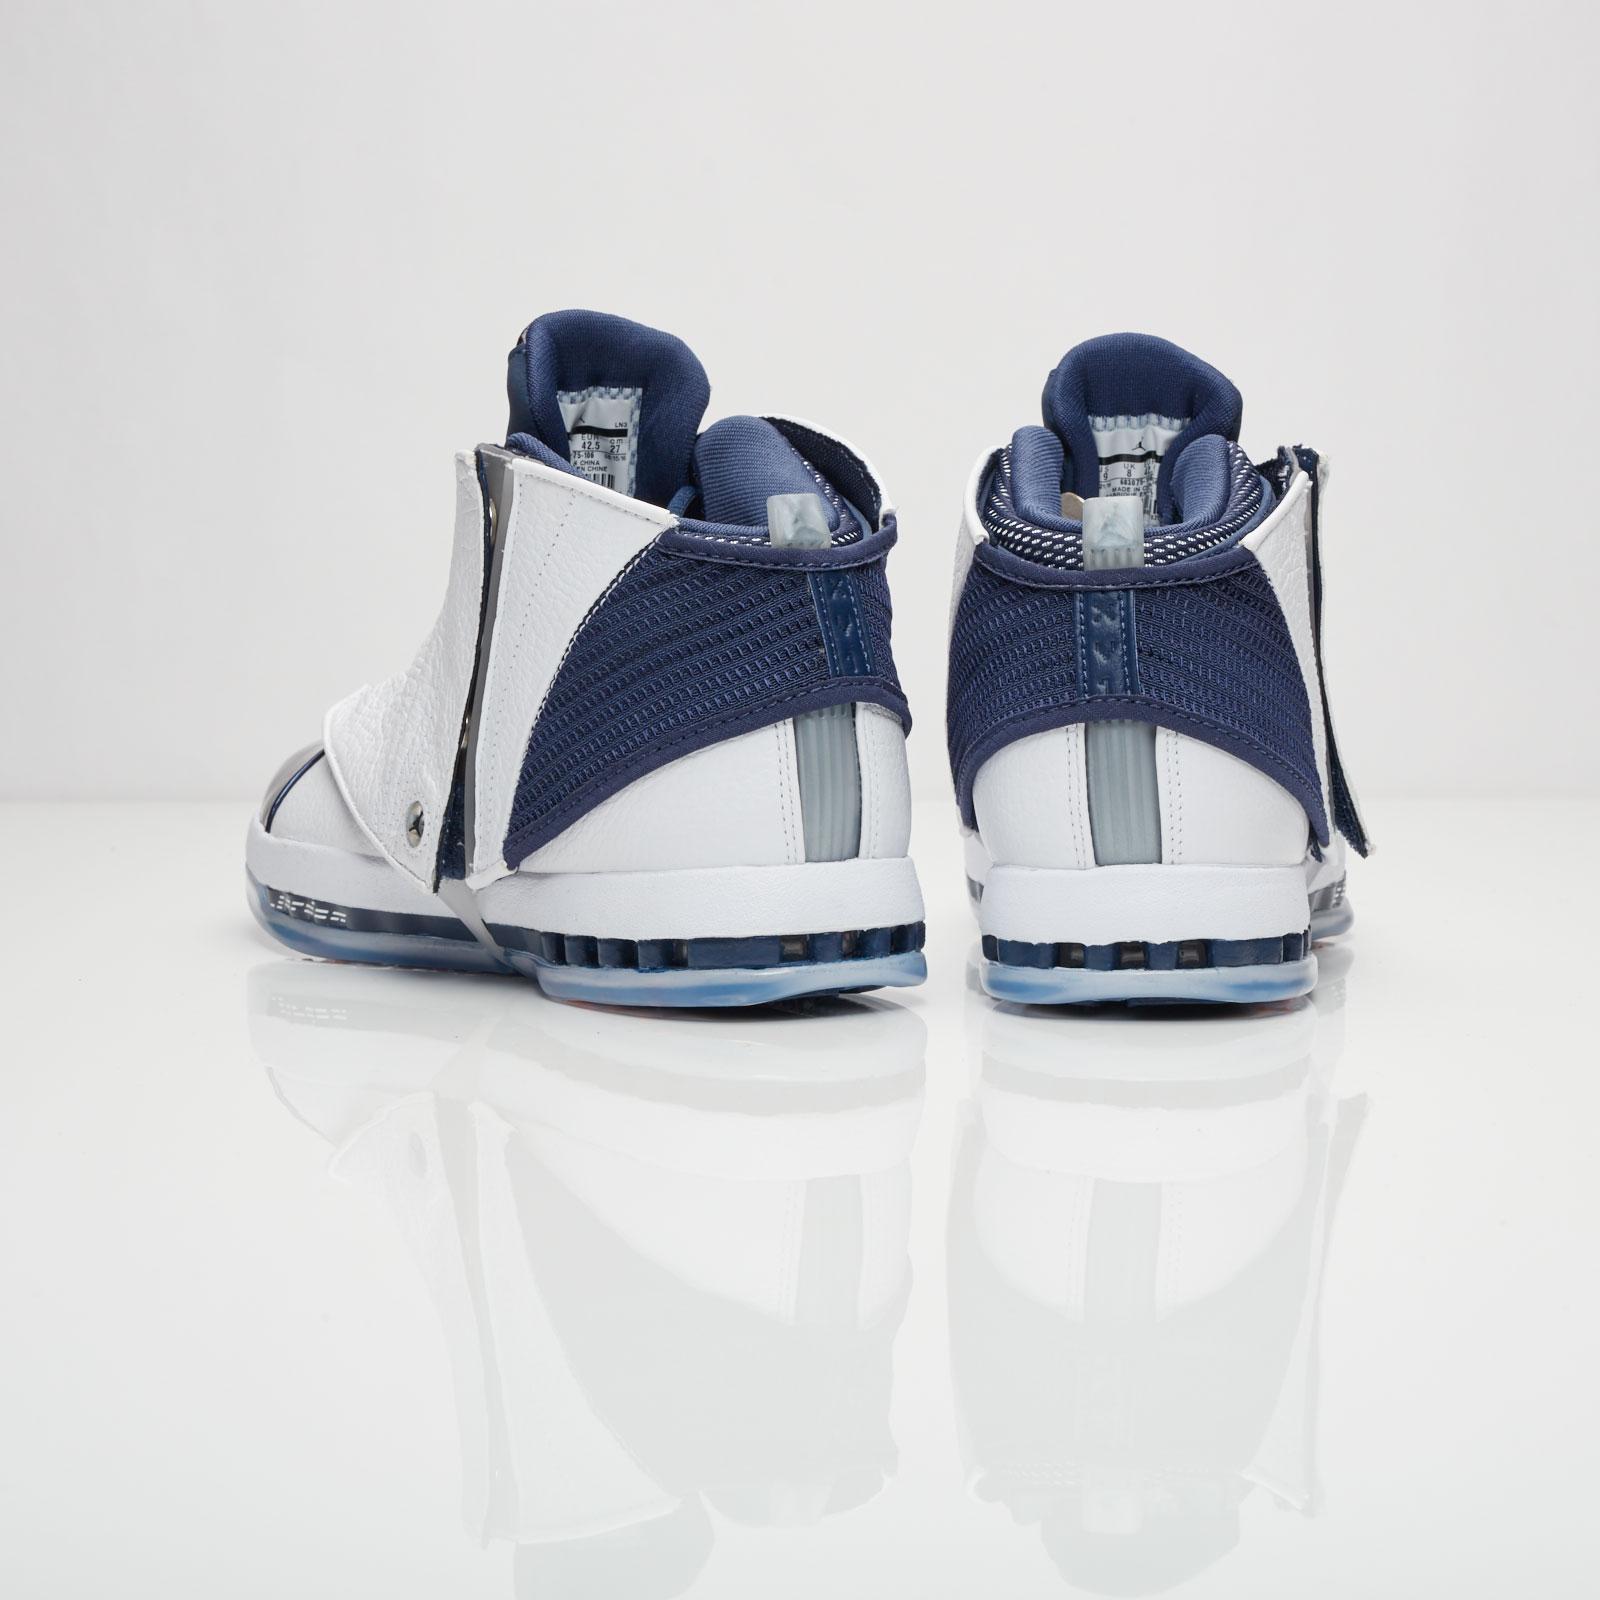 6f3c3dfb5ec Jordan Brand Air Jordan 16 Retro - 683075-106 - Sneakersnstuff | sneakers &  streetwear online since 1999